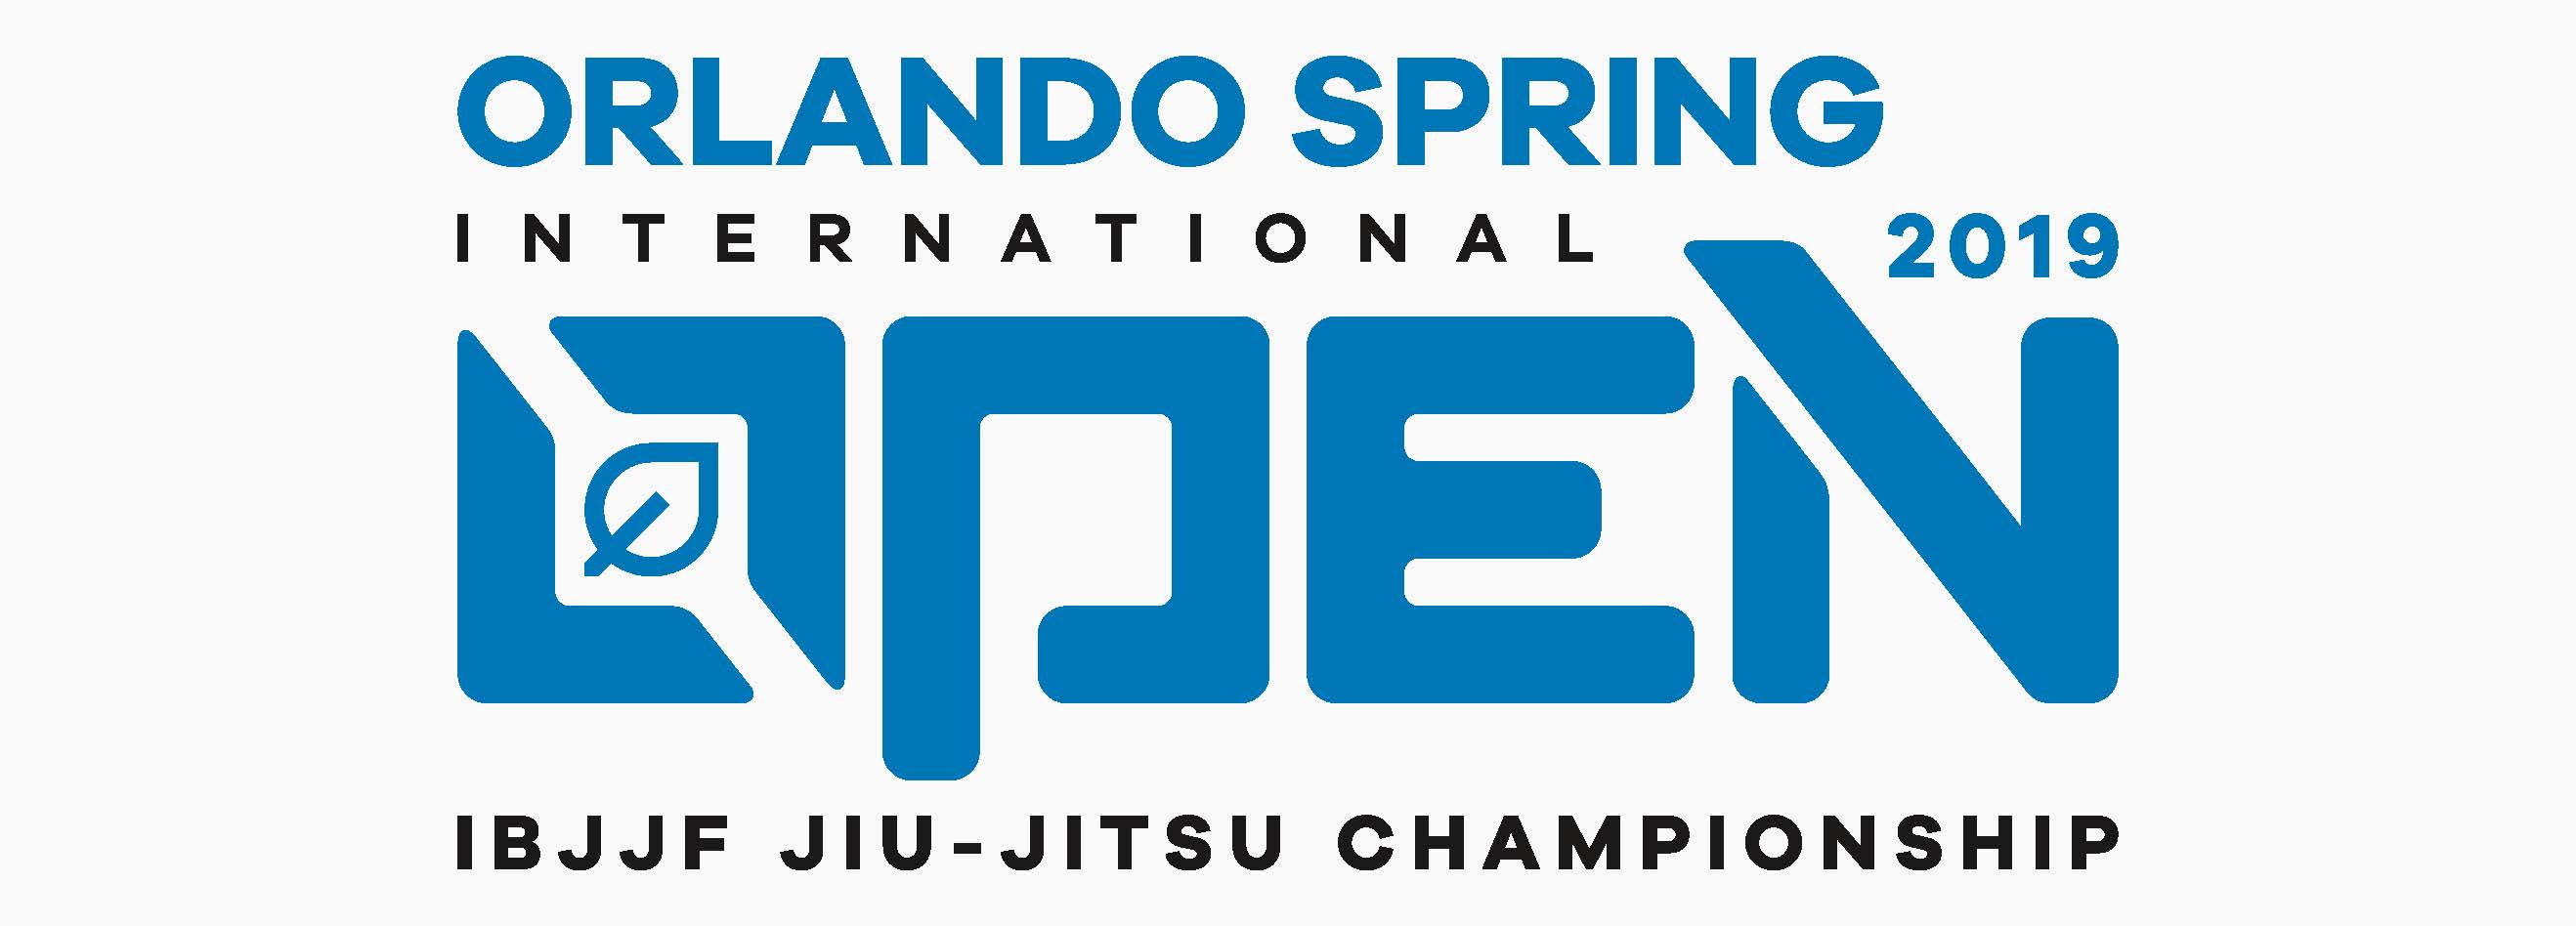 orlandoSpring2019-logo banner 1.jpg